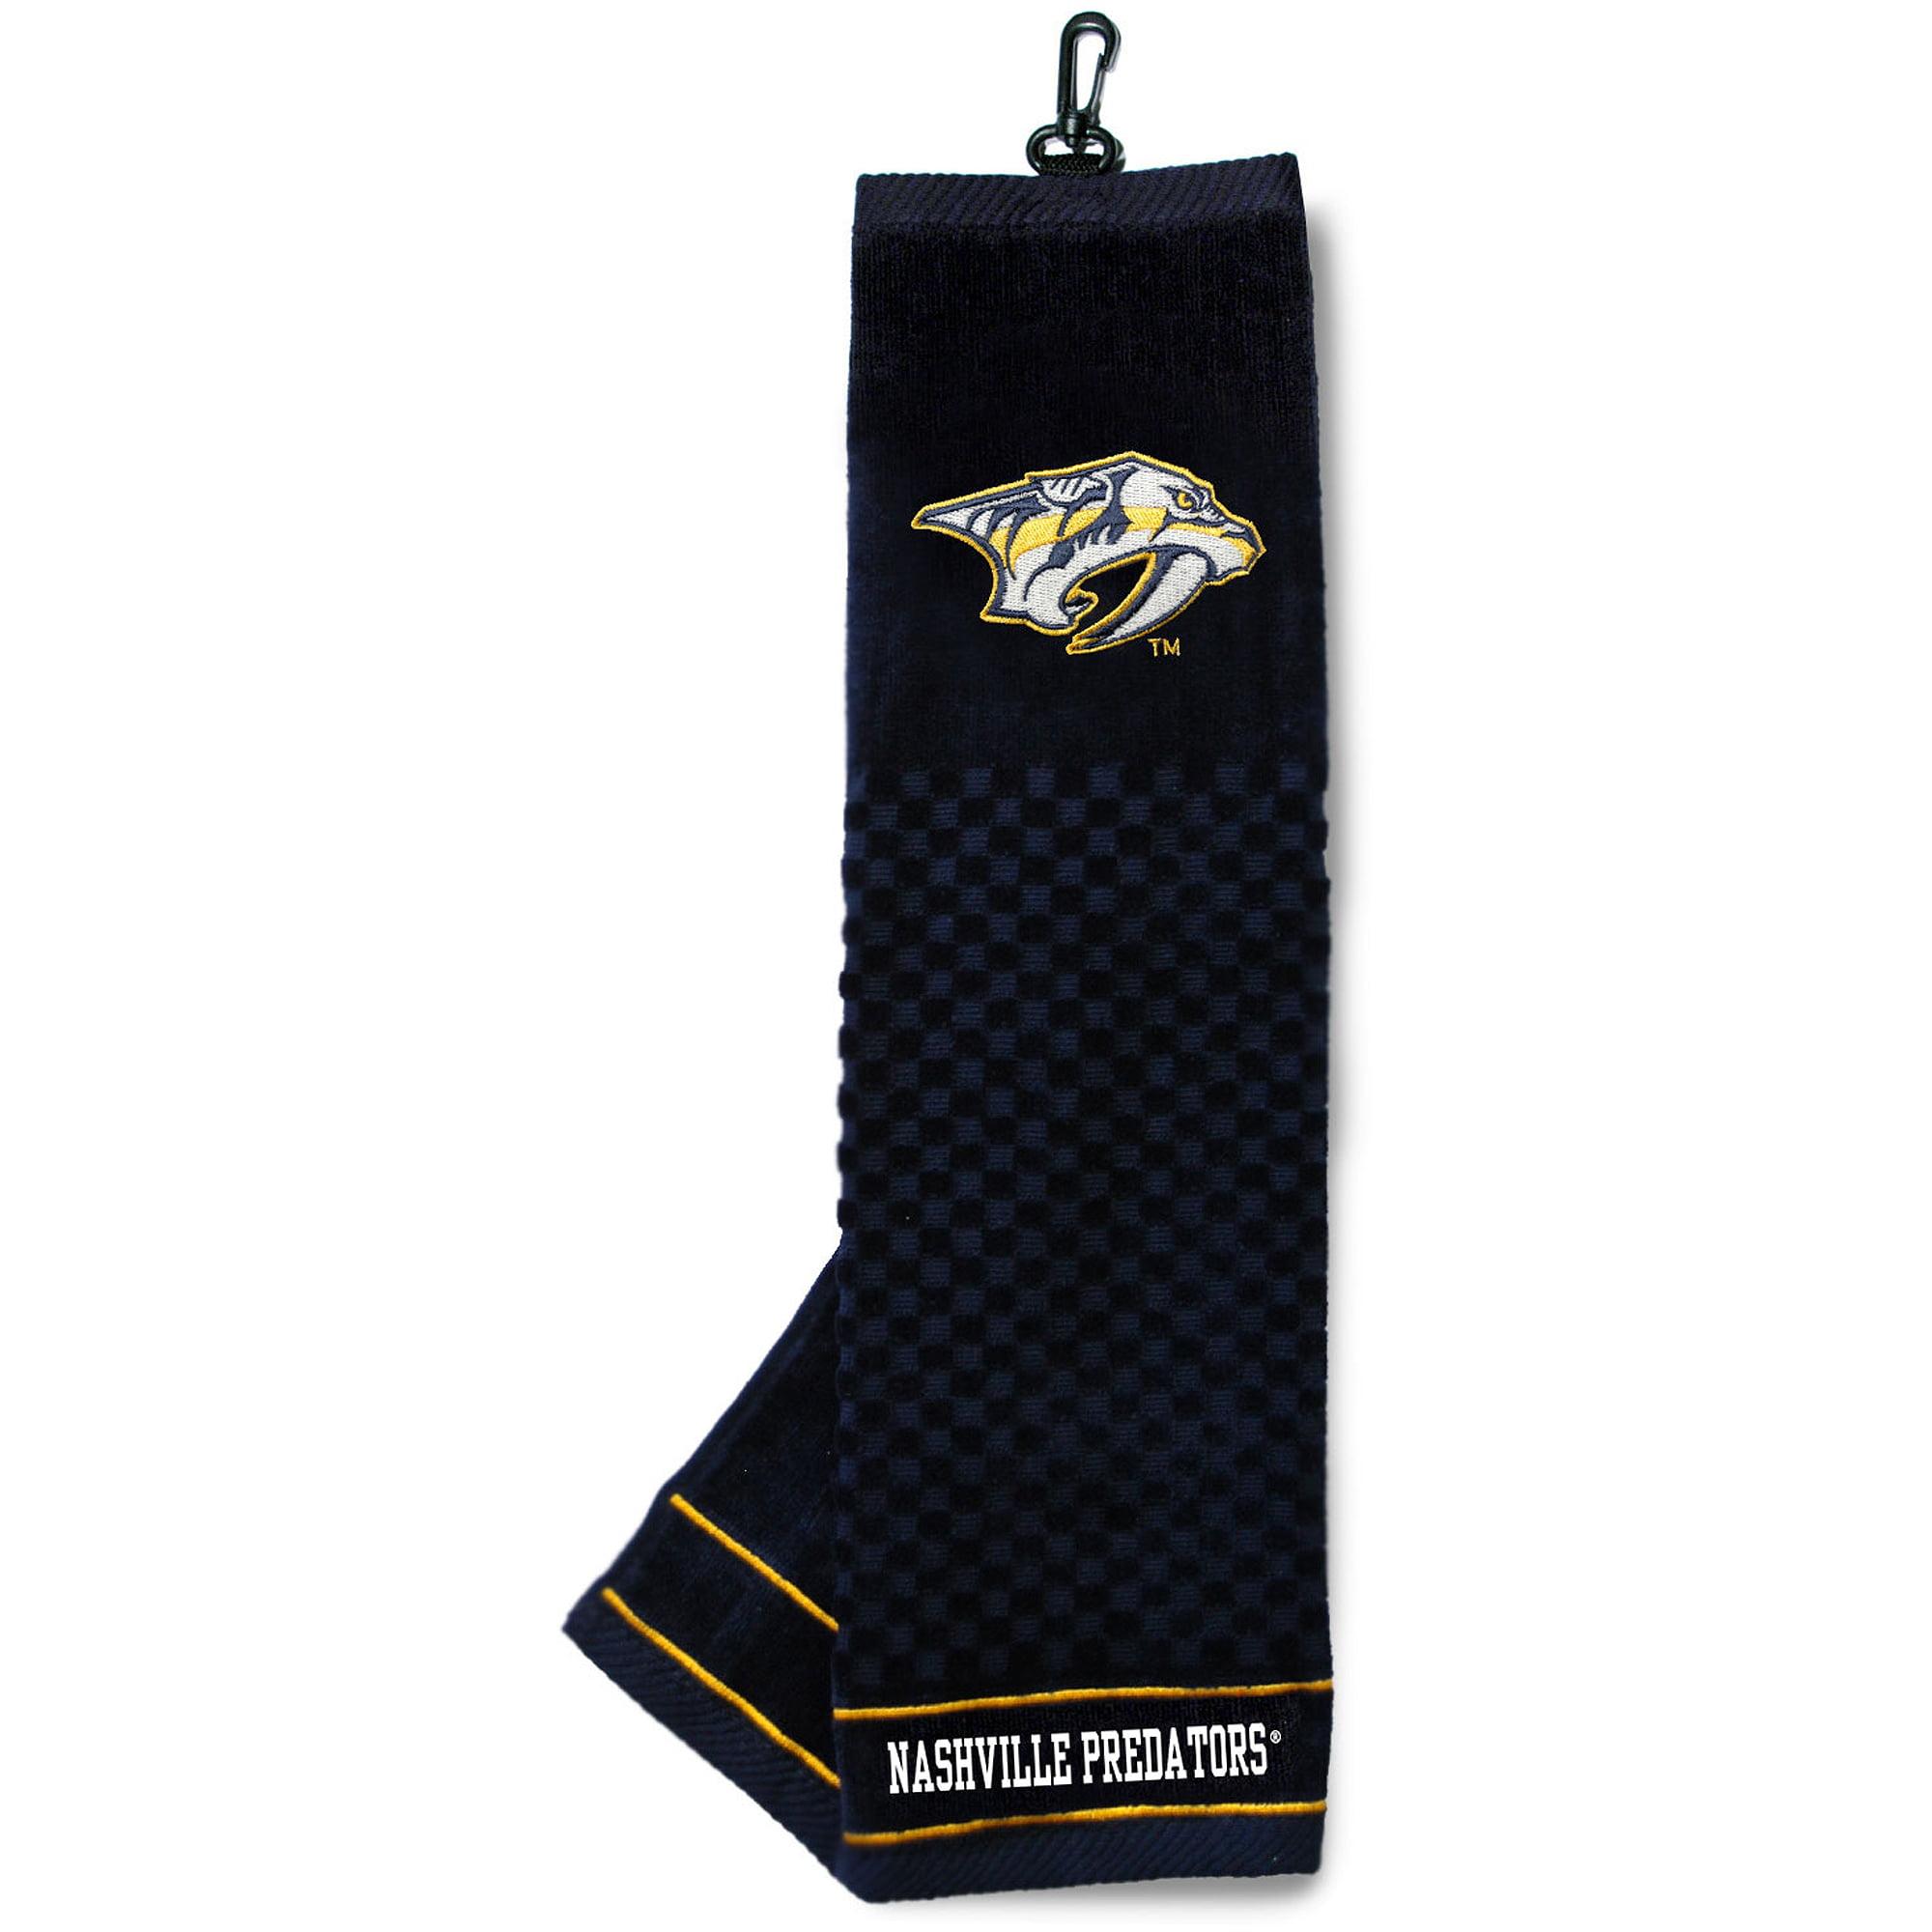 Nashville Predators Embroidered Towel